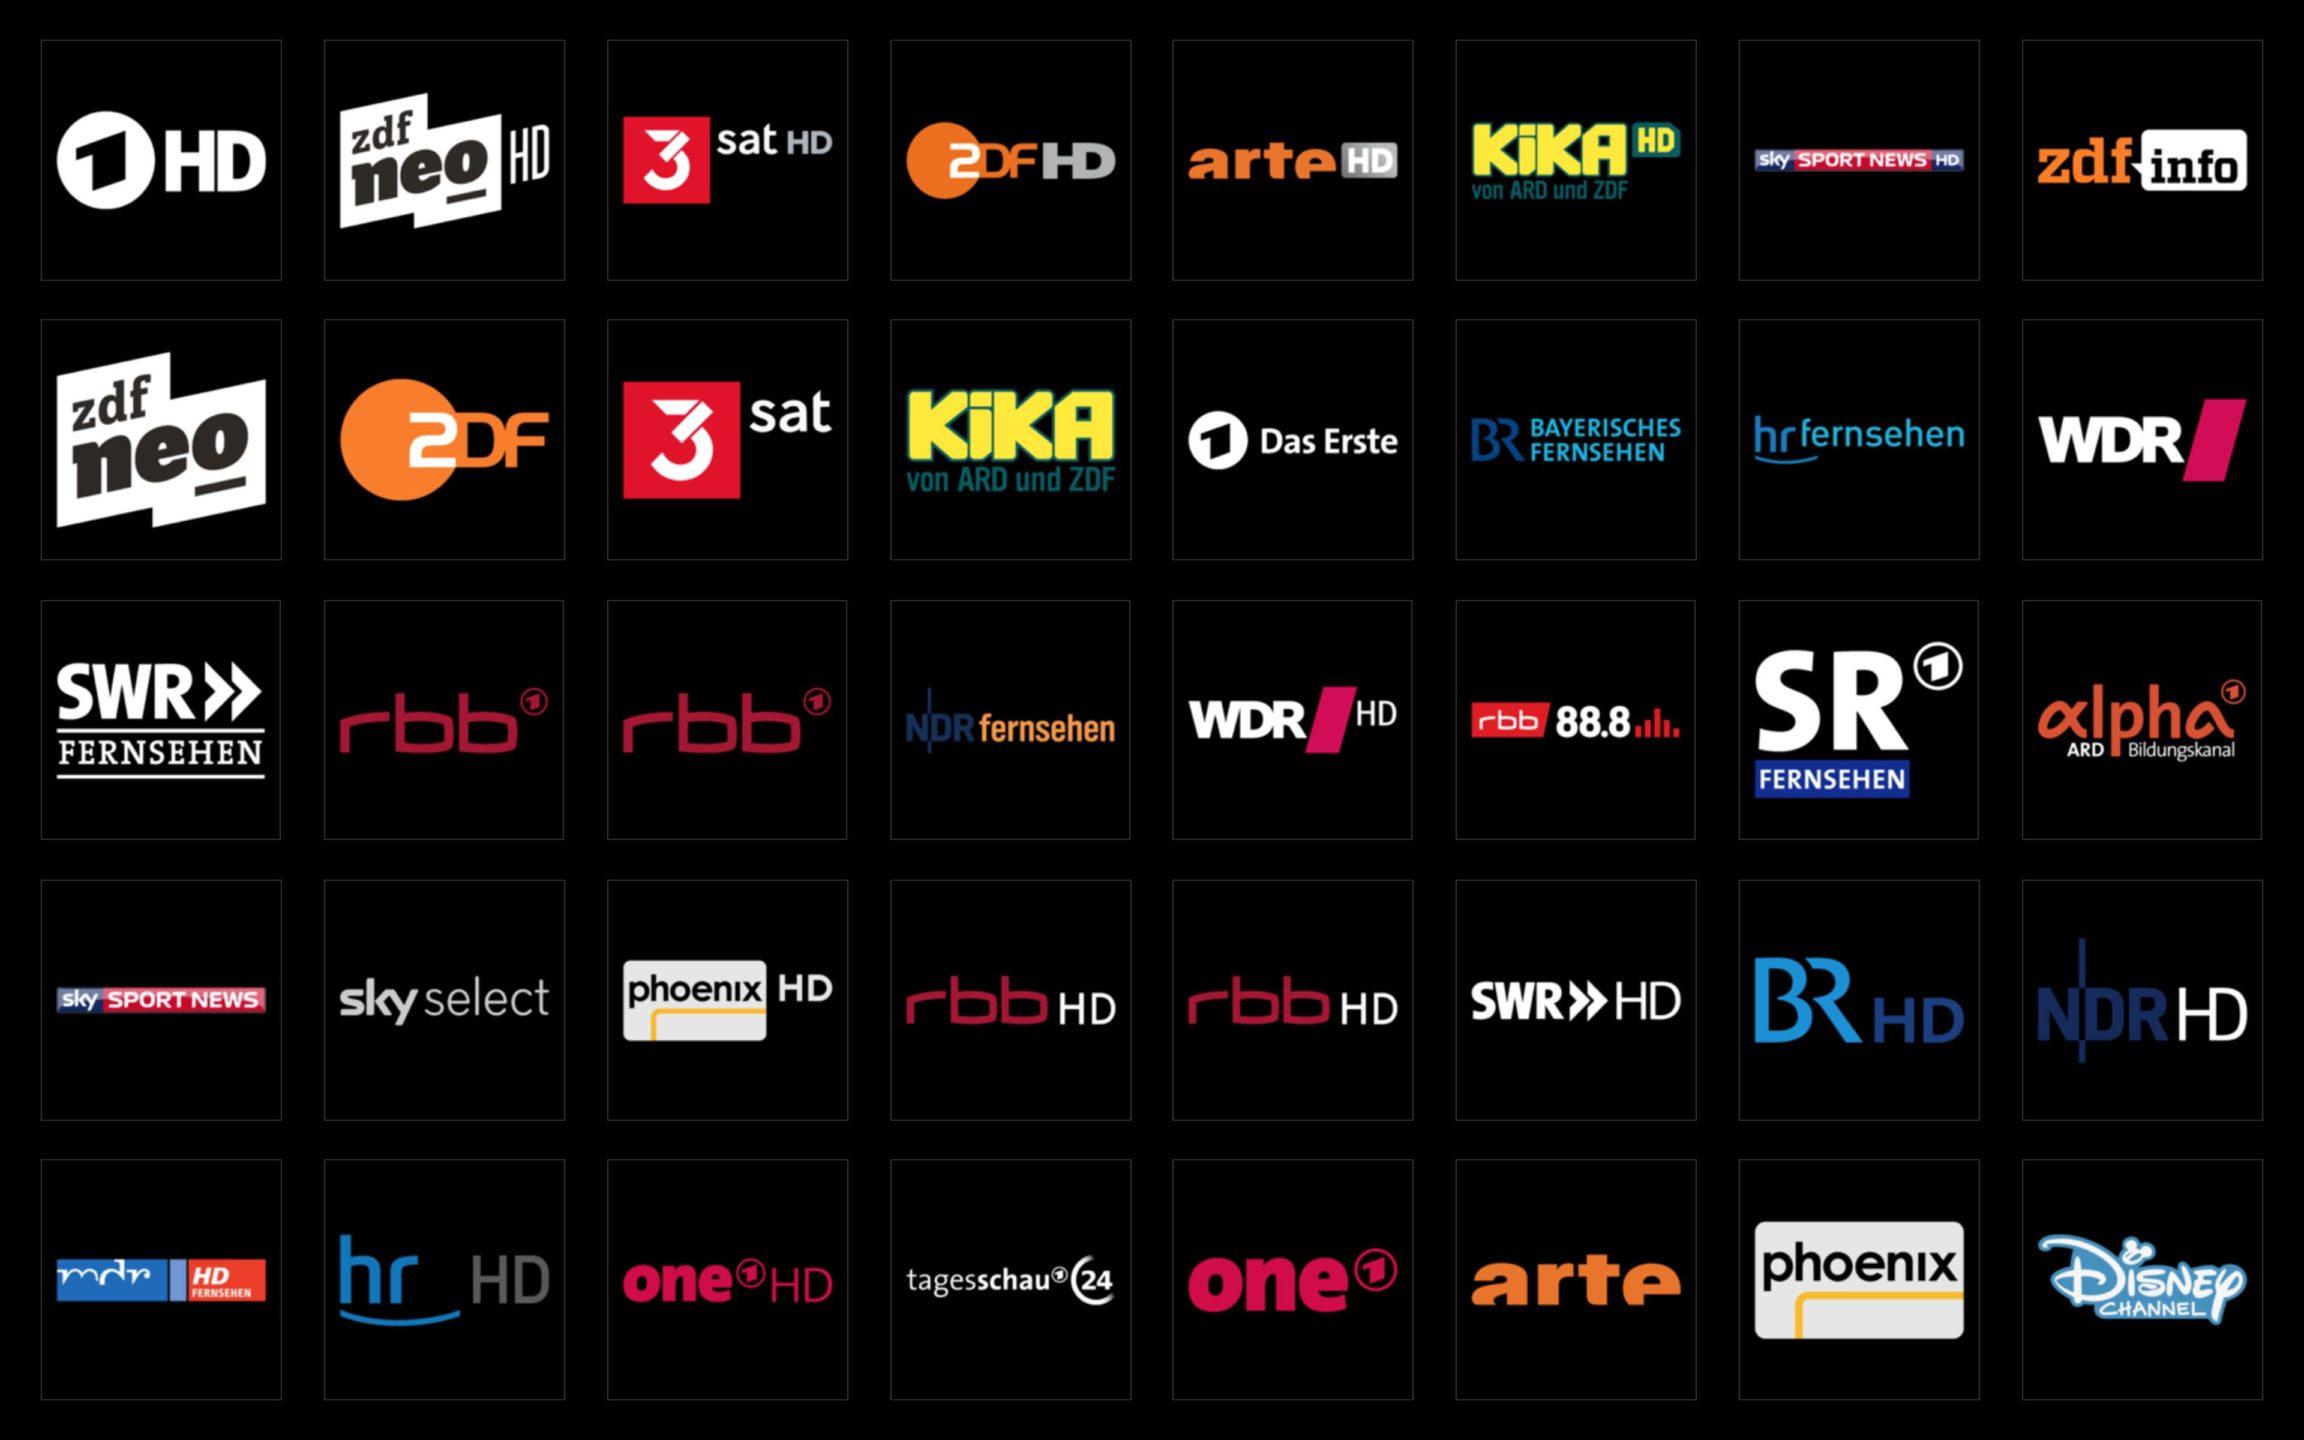 Picons Hell TV-Senderlogos DVB-C